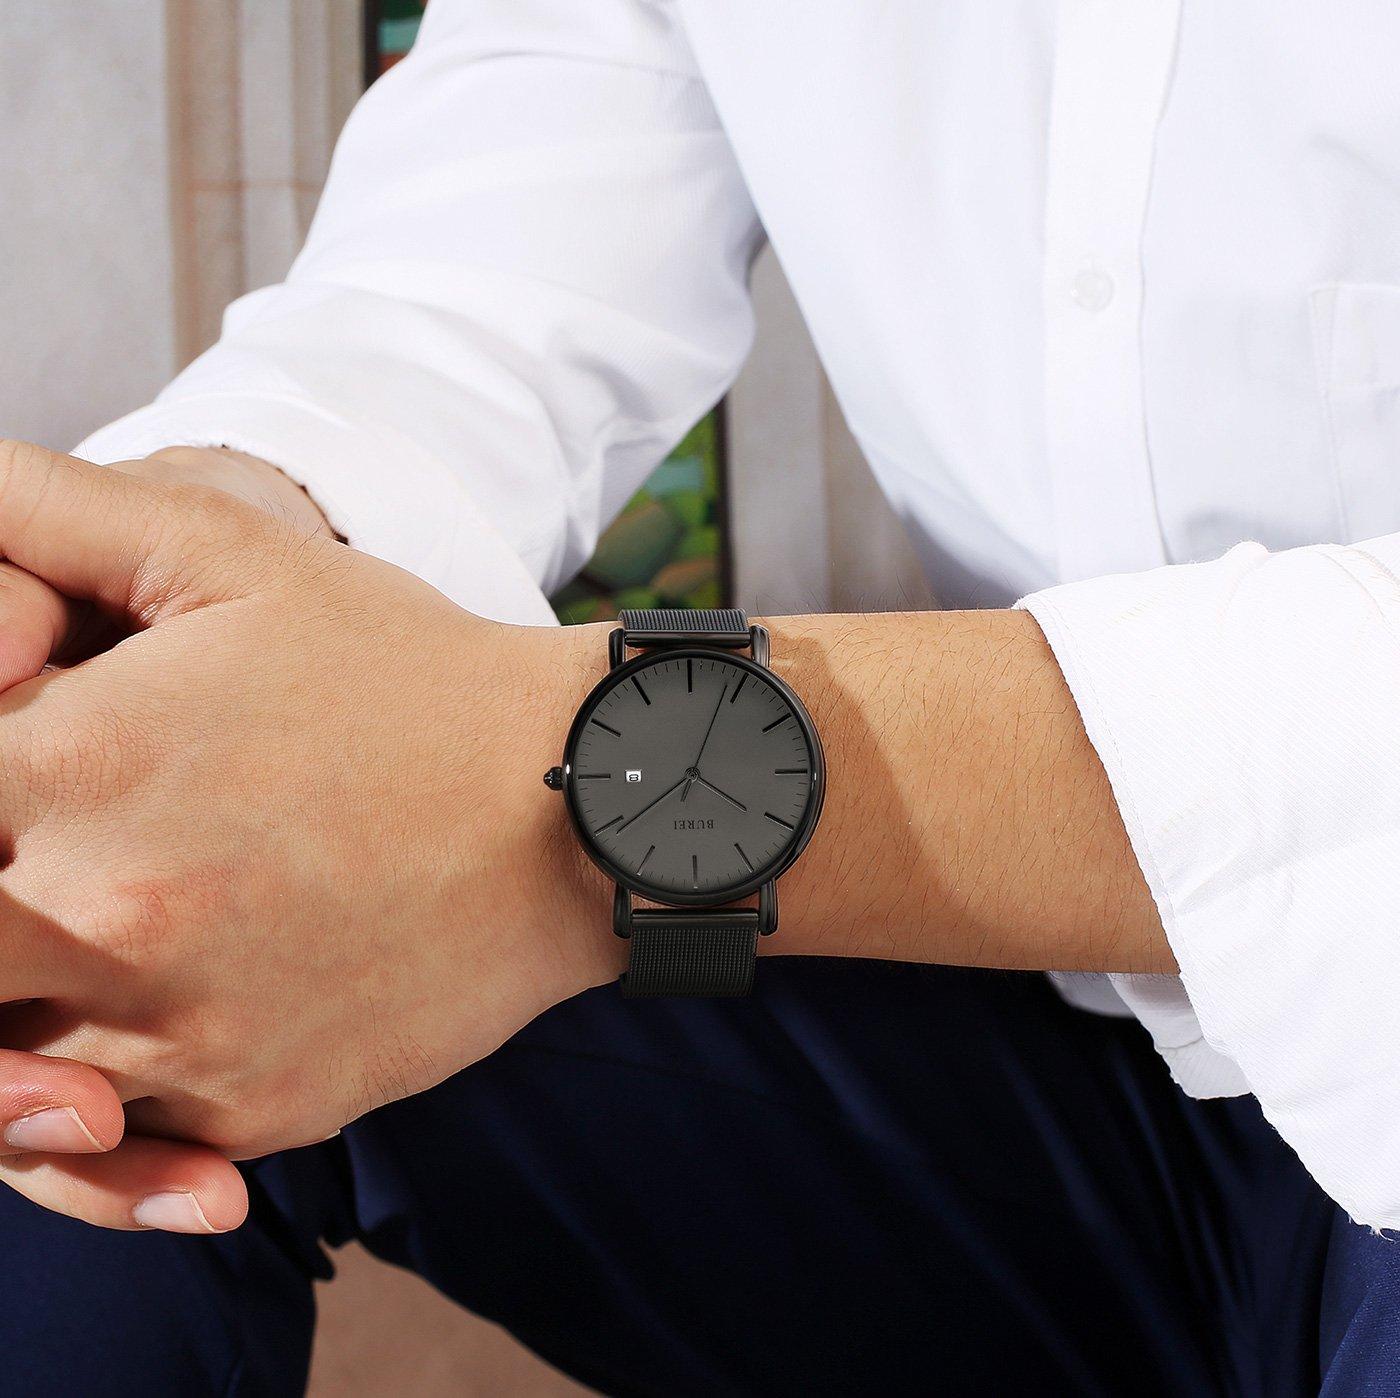 BUREI Men's Fashion Minimalist Wrist Watch Analog Deep Gray Date with Black Mesh Band by BUREI (Image #7)